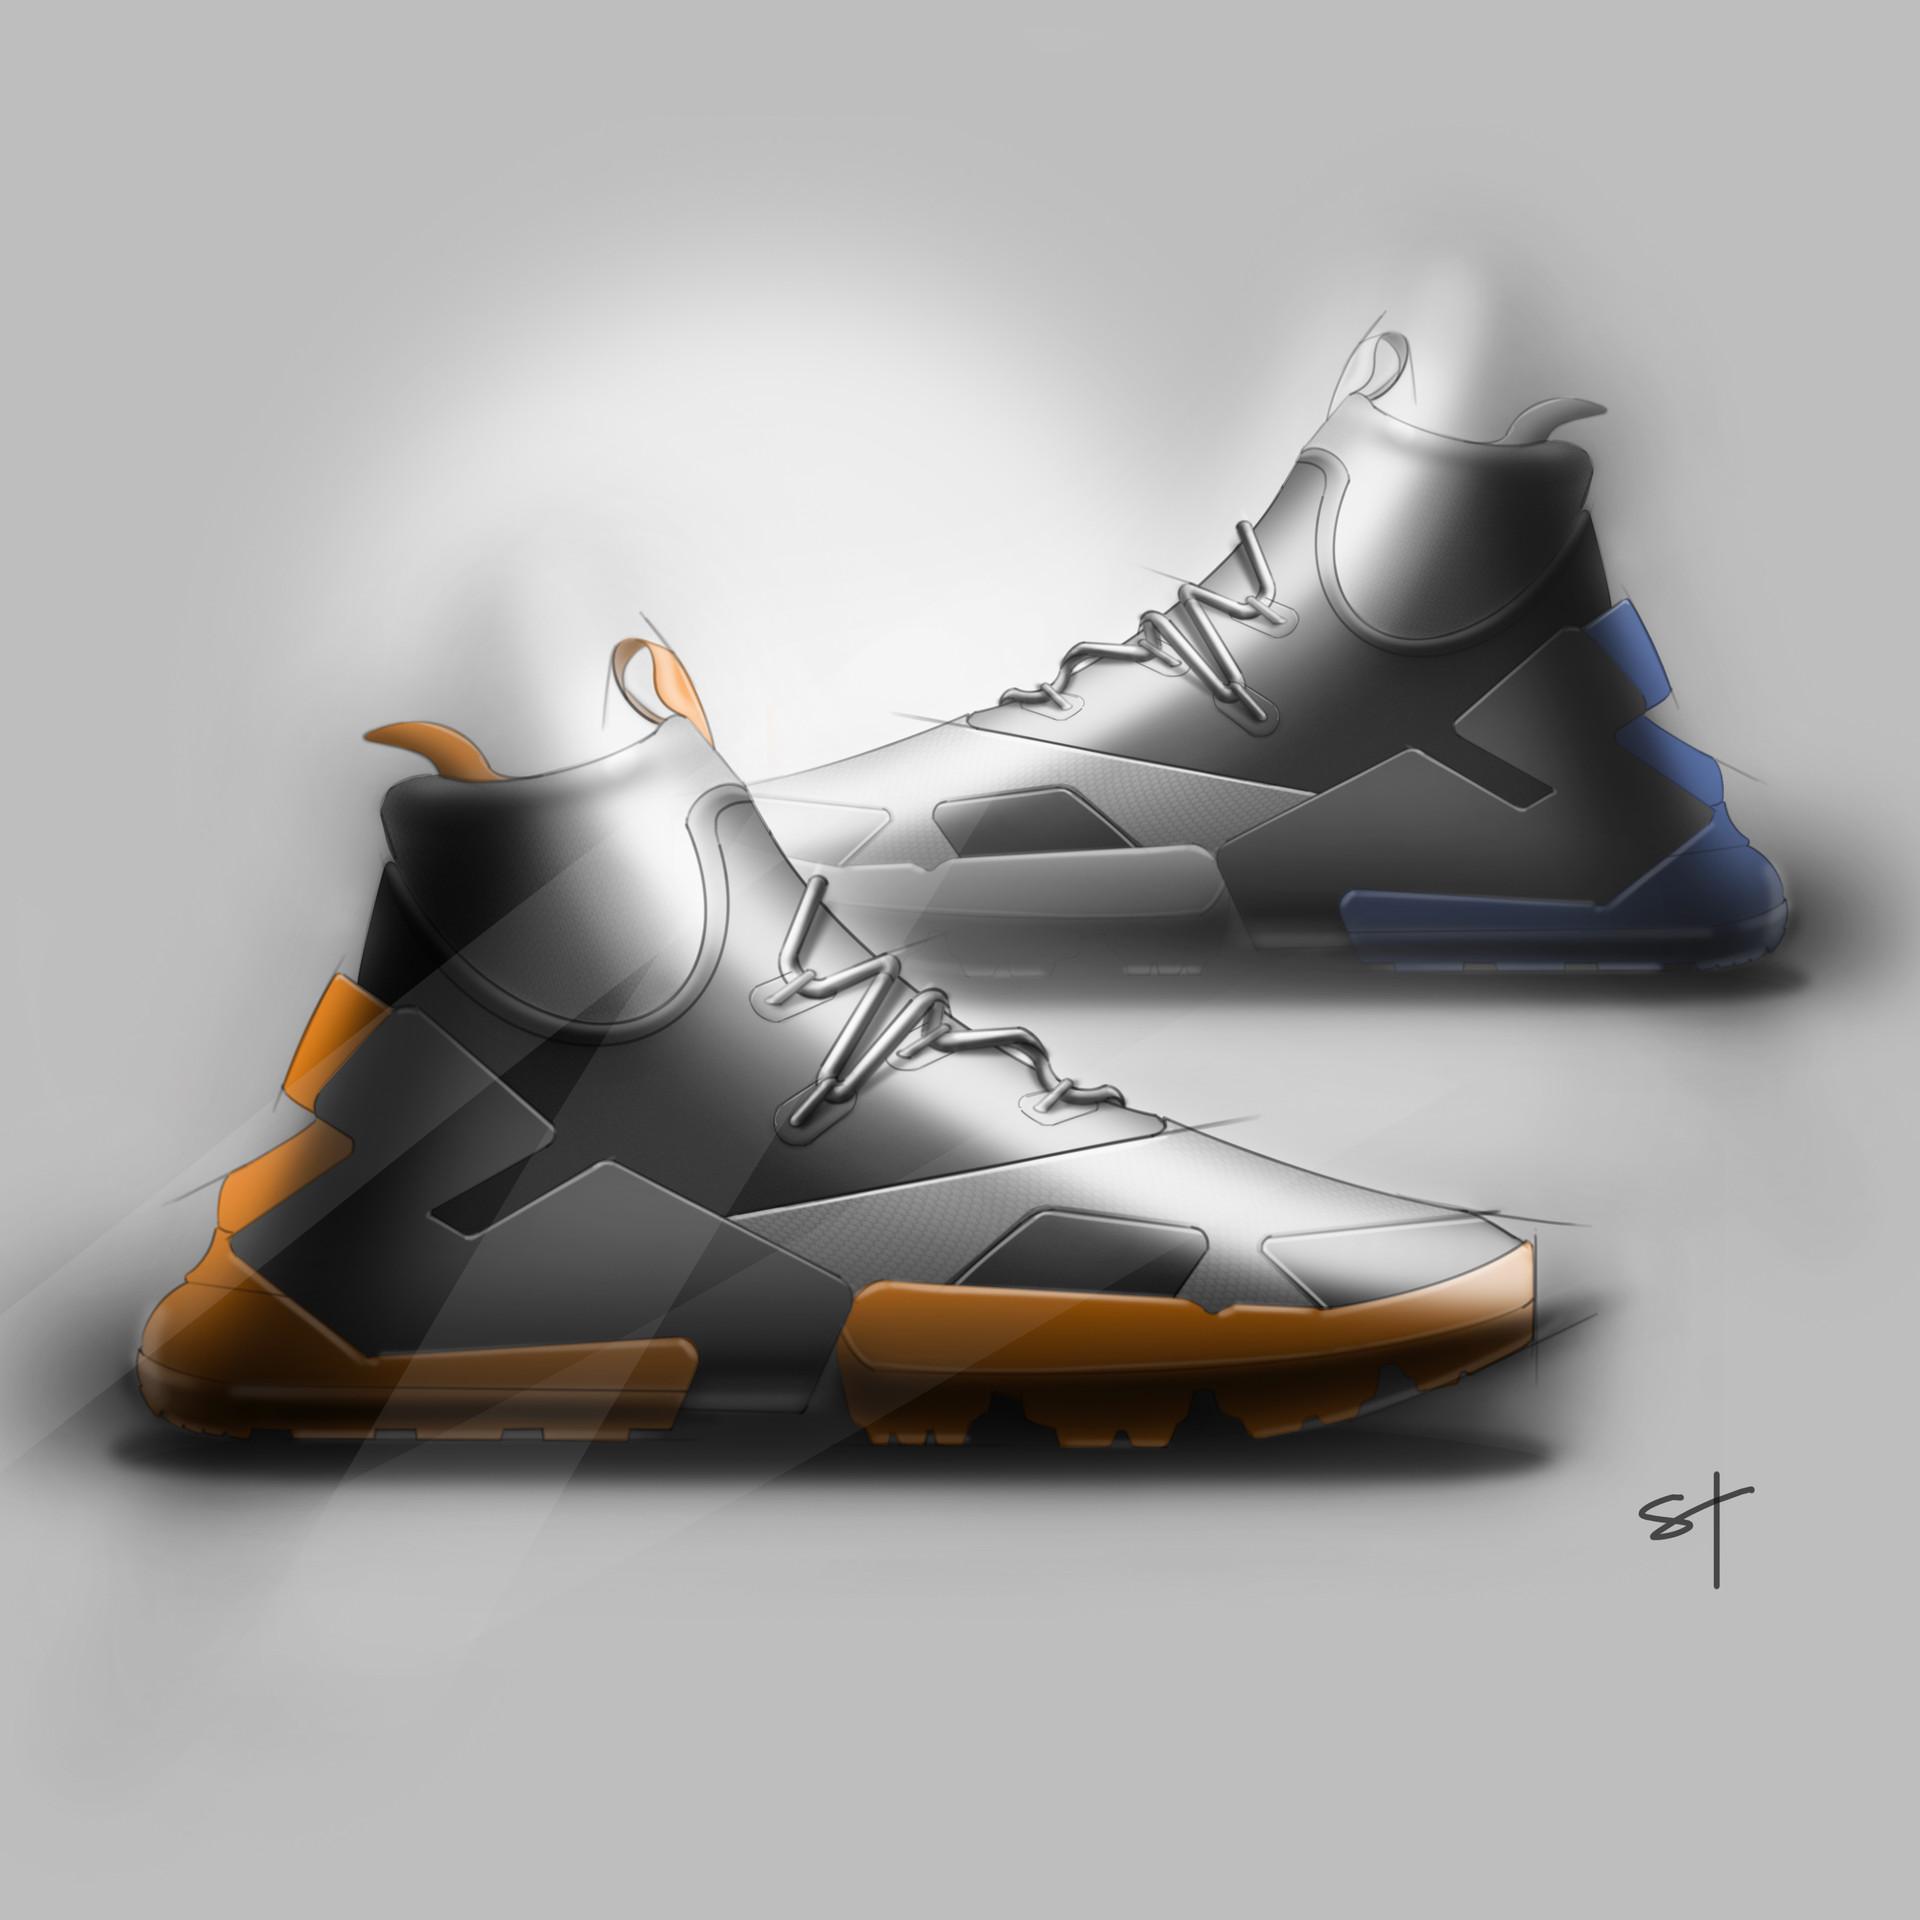 Digital Sketch of a Shoe Design Concept